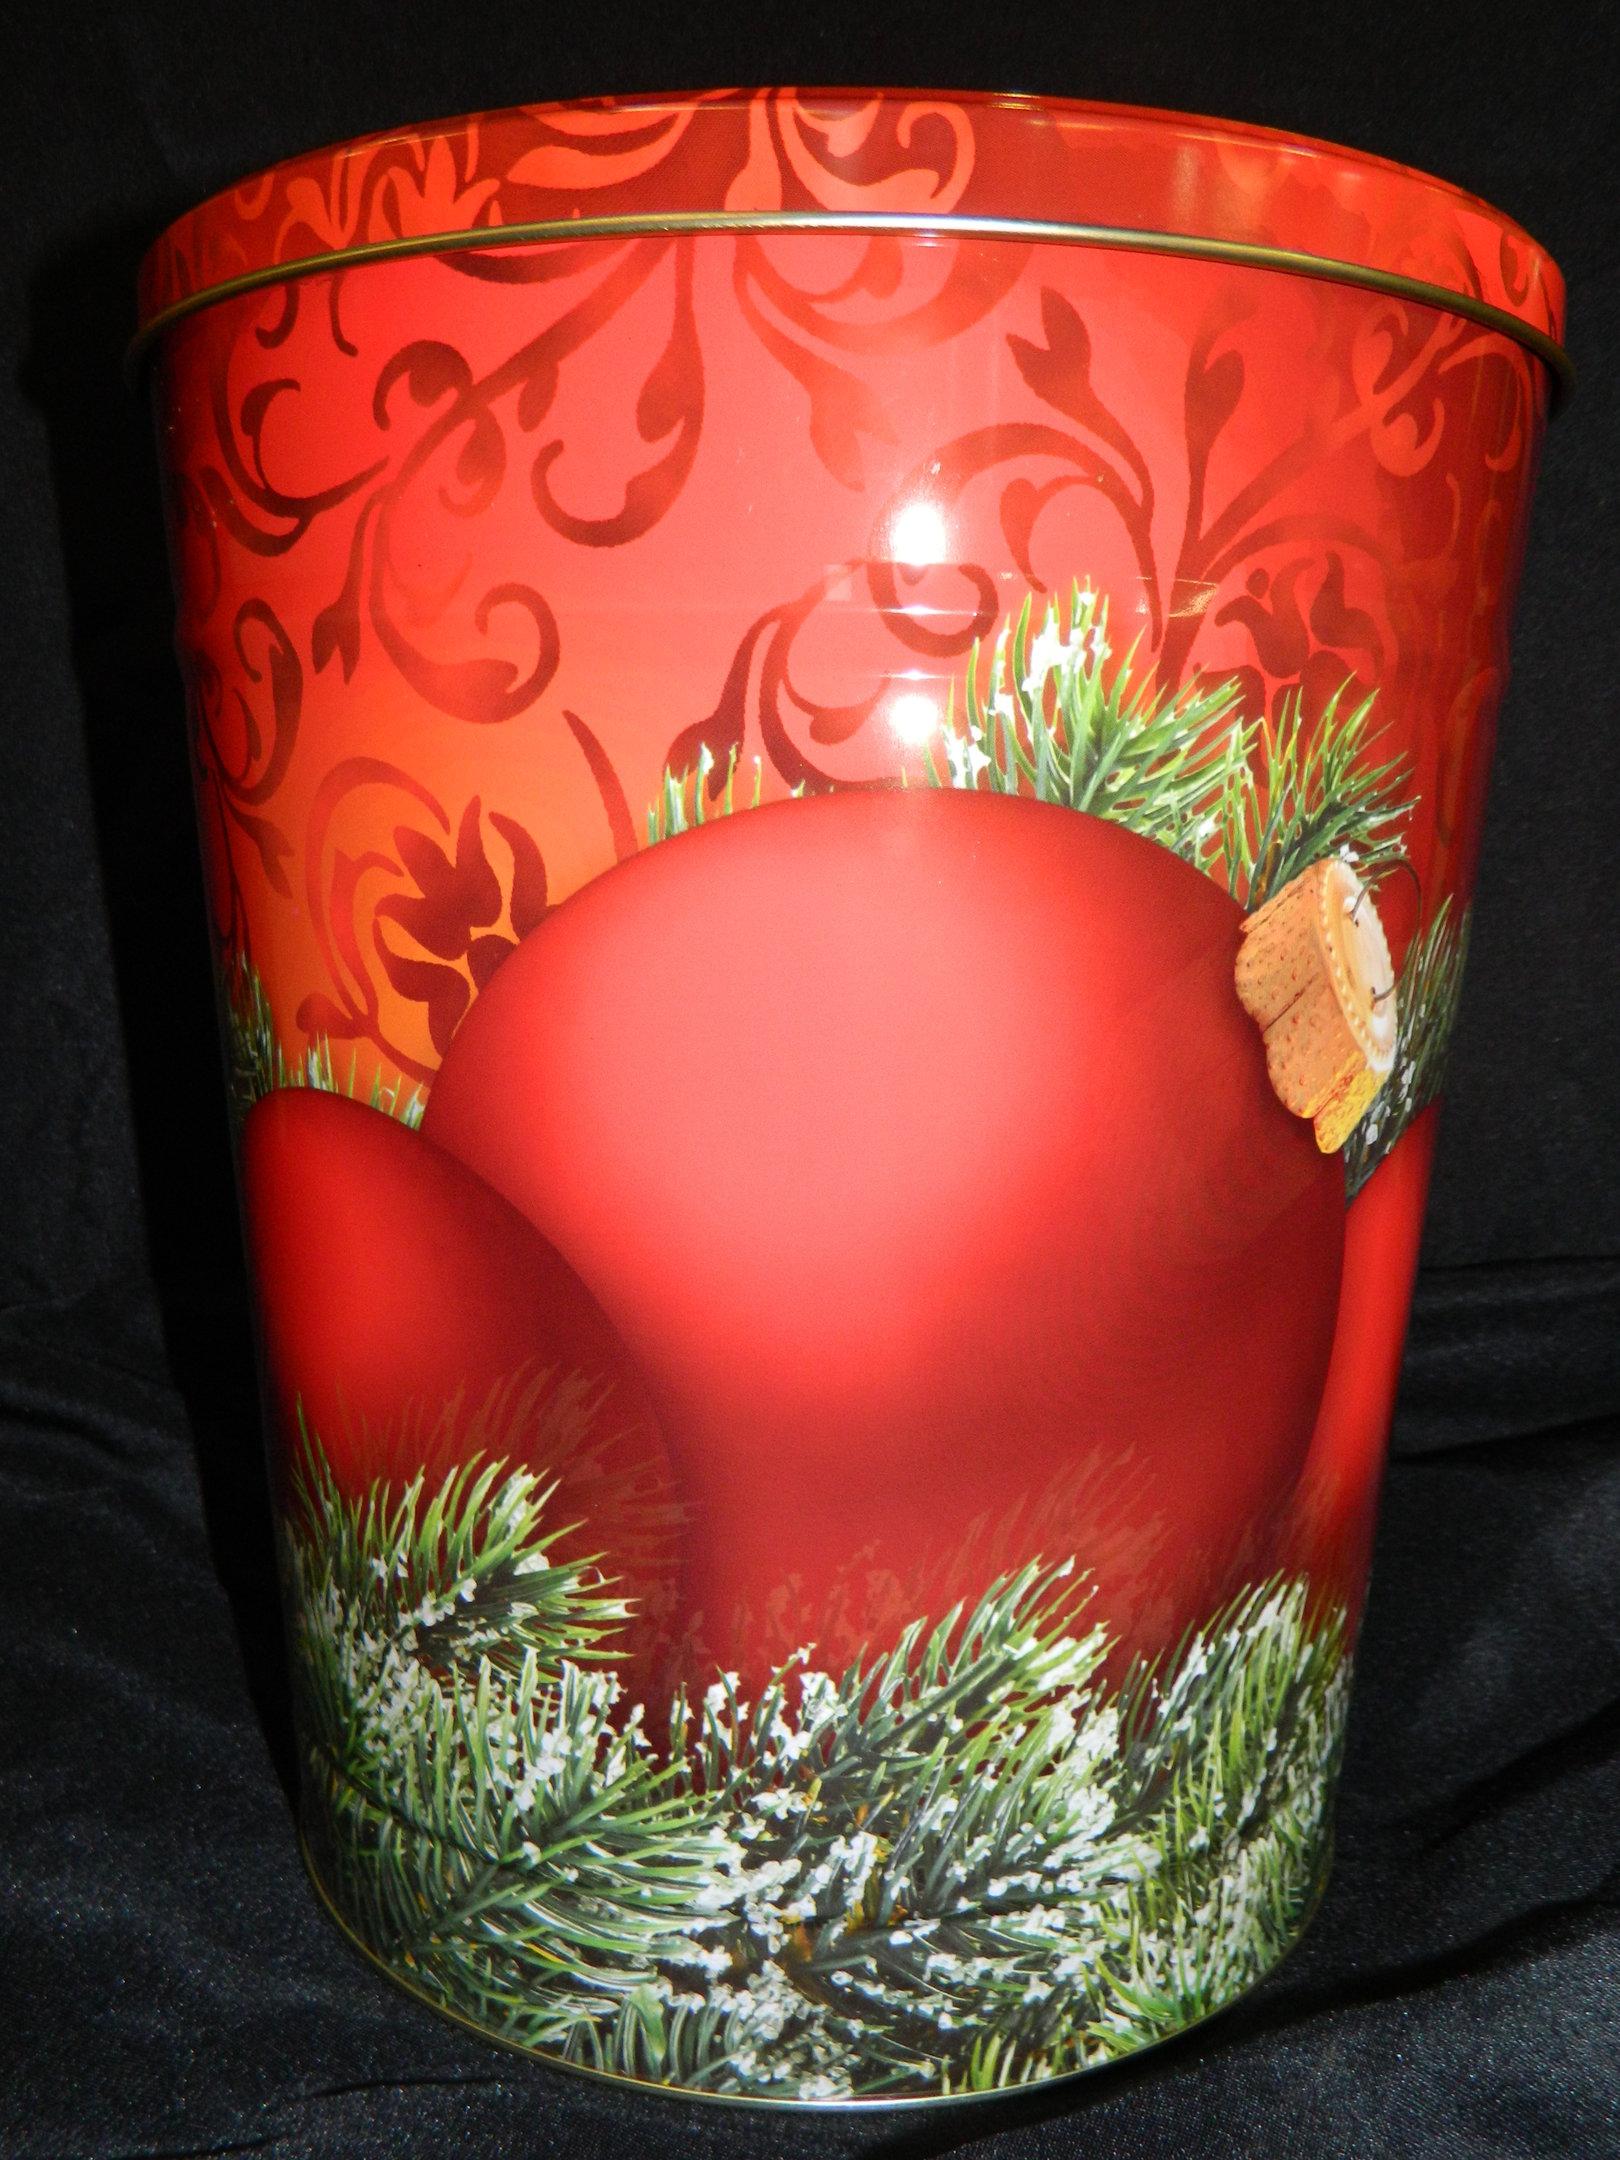 3.5 Gal Red Ornaments on Pine Popcorn Tin